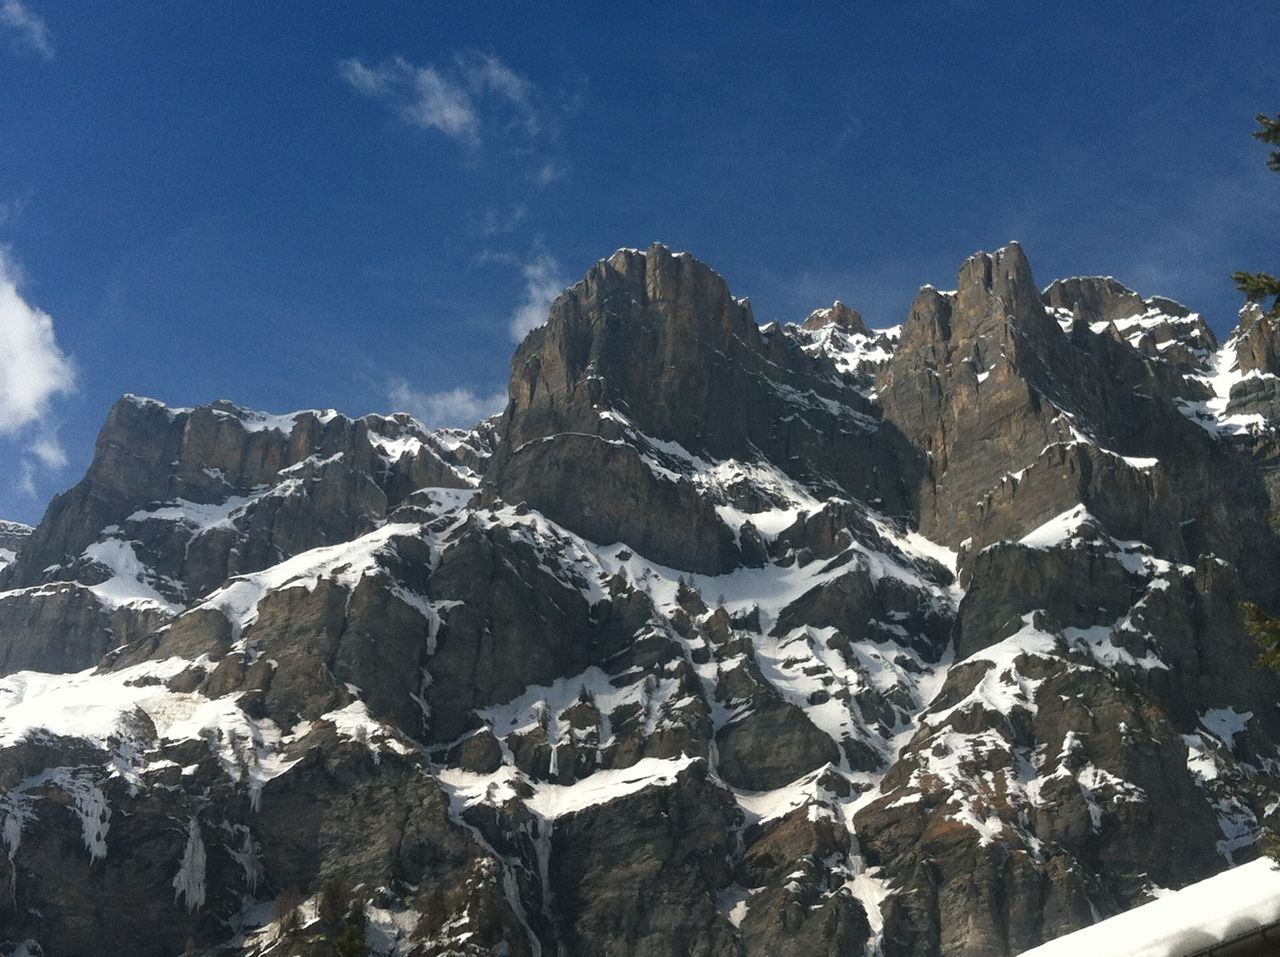 Klettersteig Daubenhorn : Daubenhorn klettersteige schweizer alpen club sac